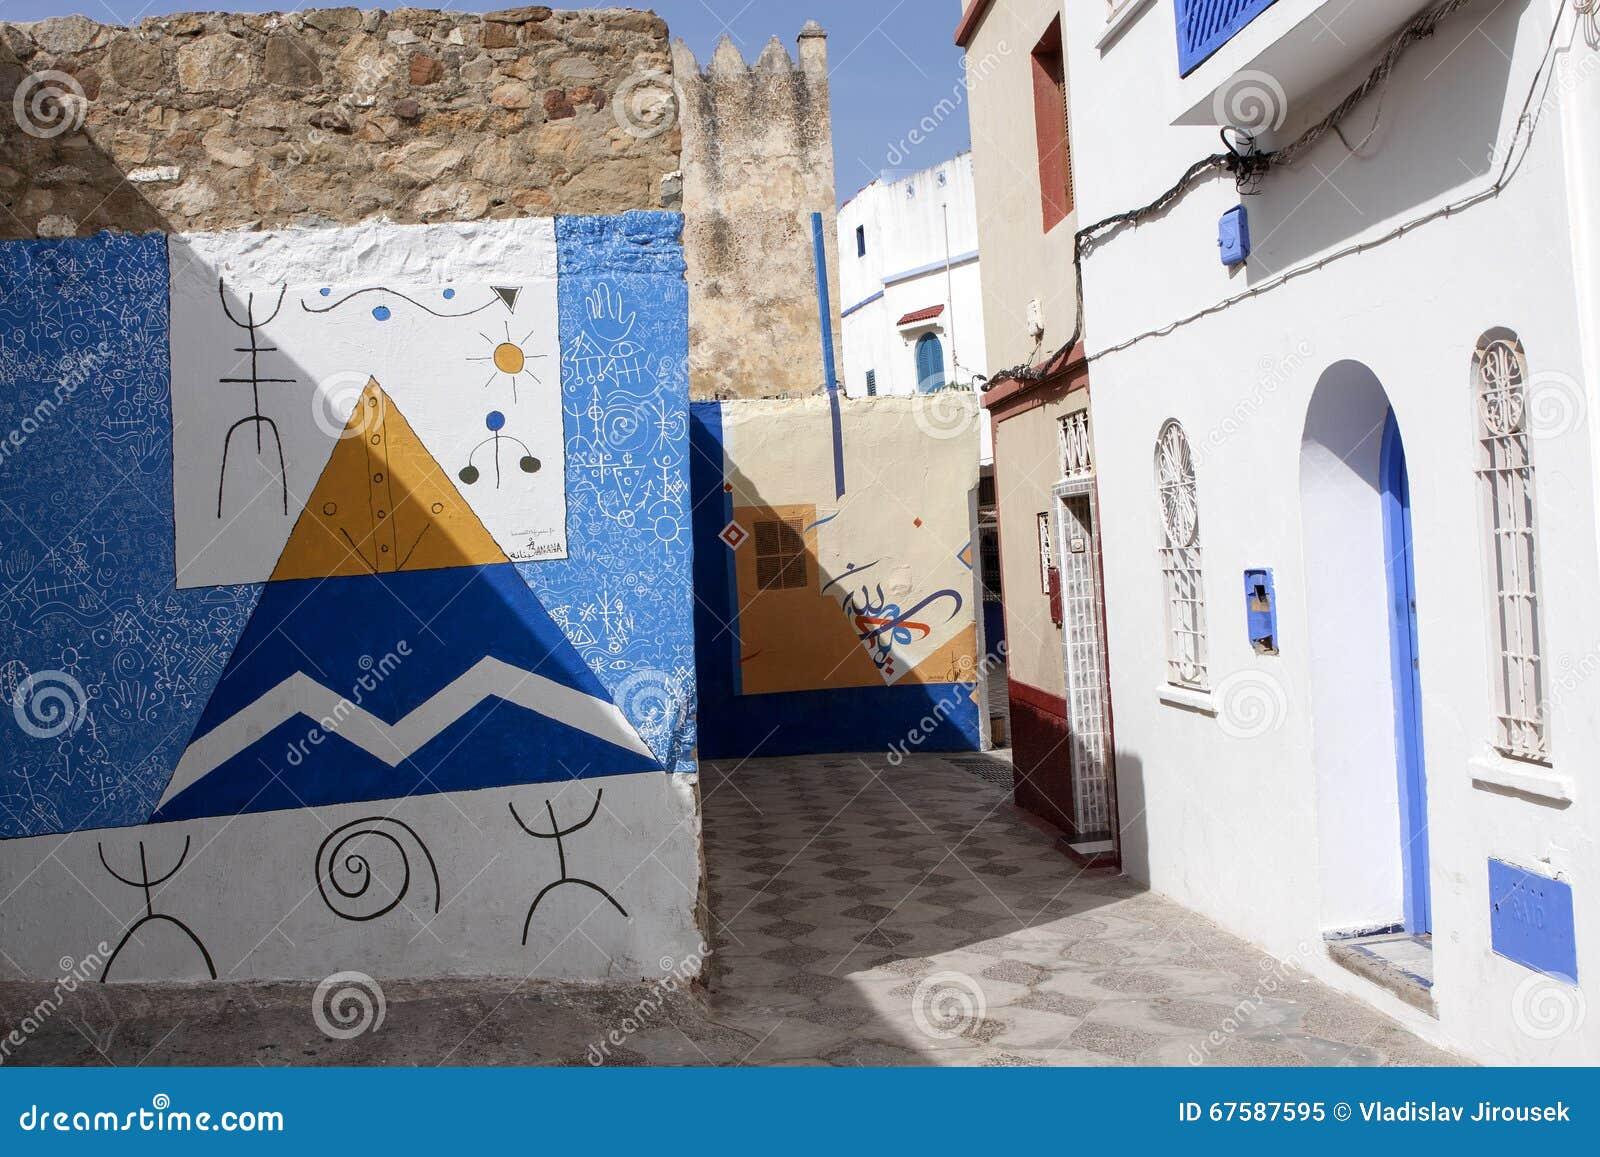 Pinturas Bonitas Nas Paredes Do Medina Asilah Em Marrocos Do Norte  -> Fotos De Paredes Bonitas